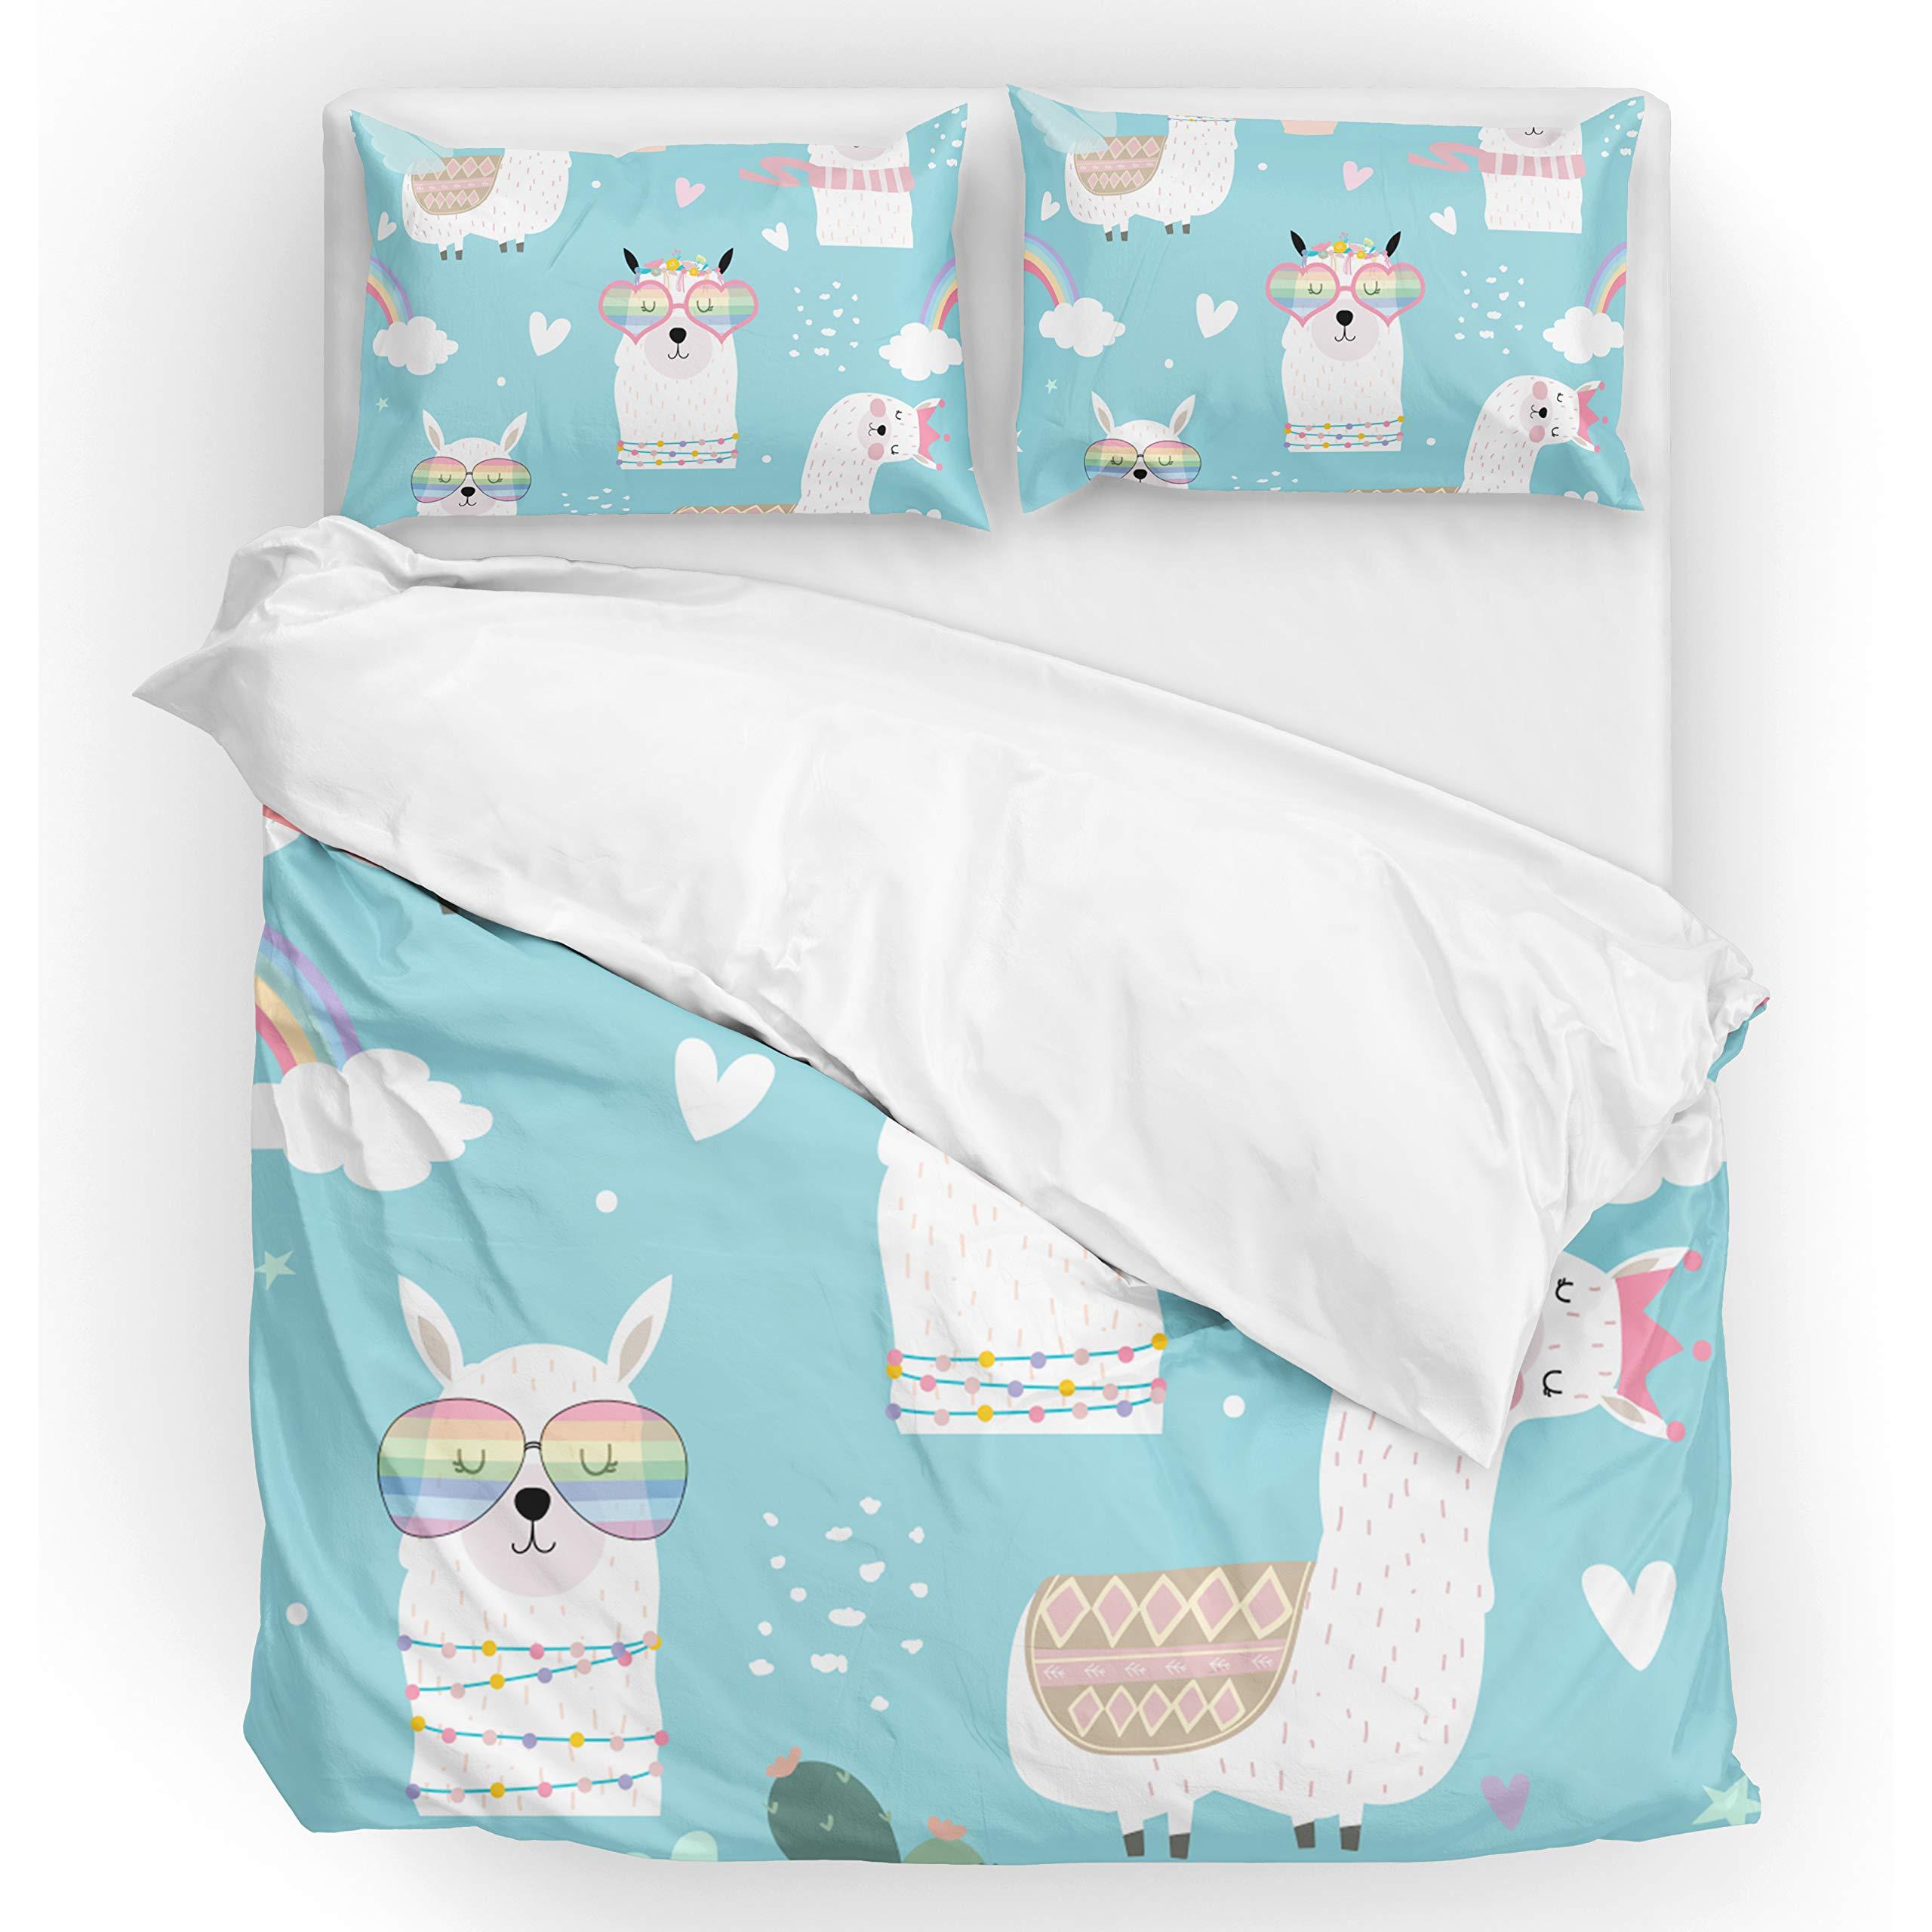 U LIFE Bedding Duvet Cover Set Queen Size 3 Piece Set 1 Quilt Cover and 2 Pillow Cases Shams Cute Llamas Camel Rainbow Blue for Kid Boy Girl Women Men